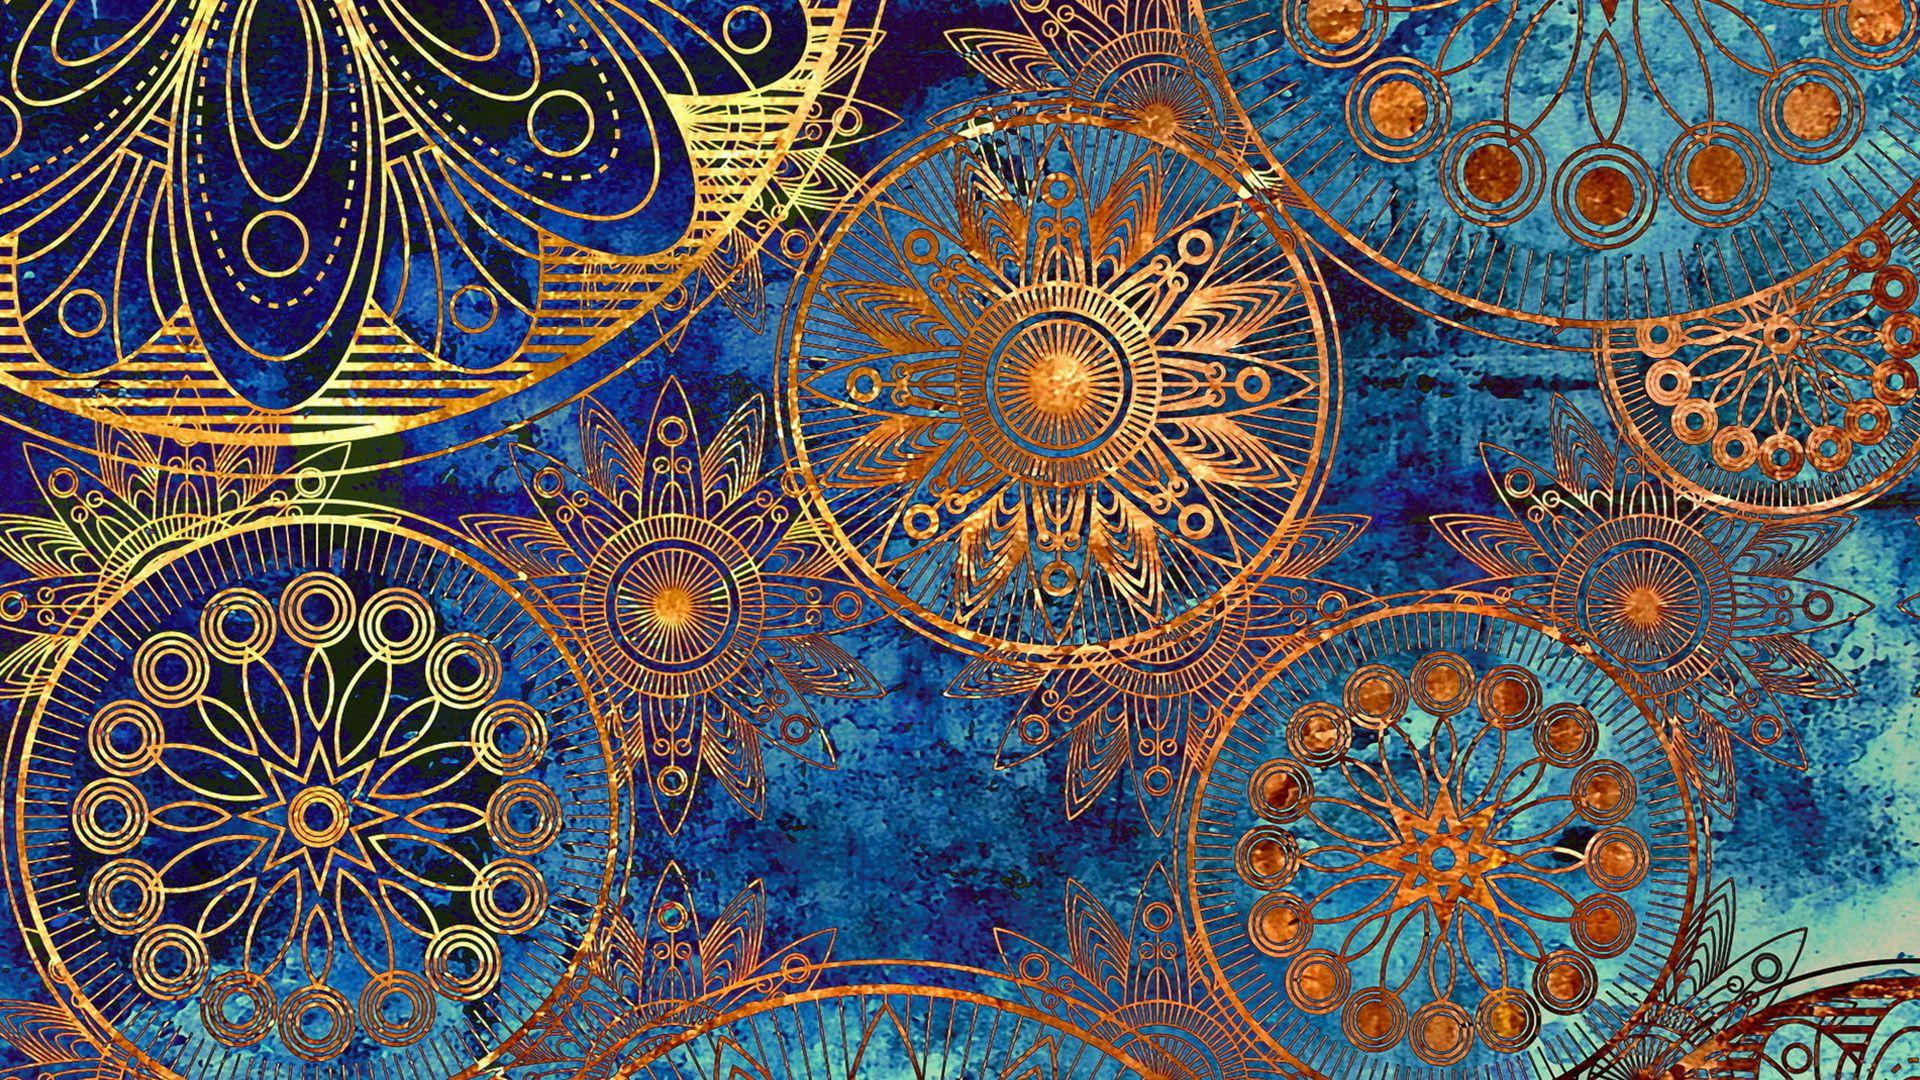 Art Deco Wallpaper Hd Desktop Wallpapers Art Deco Wallpaper Wallpapers Vintage Vintage Wallpaper